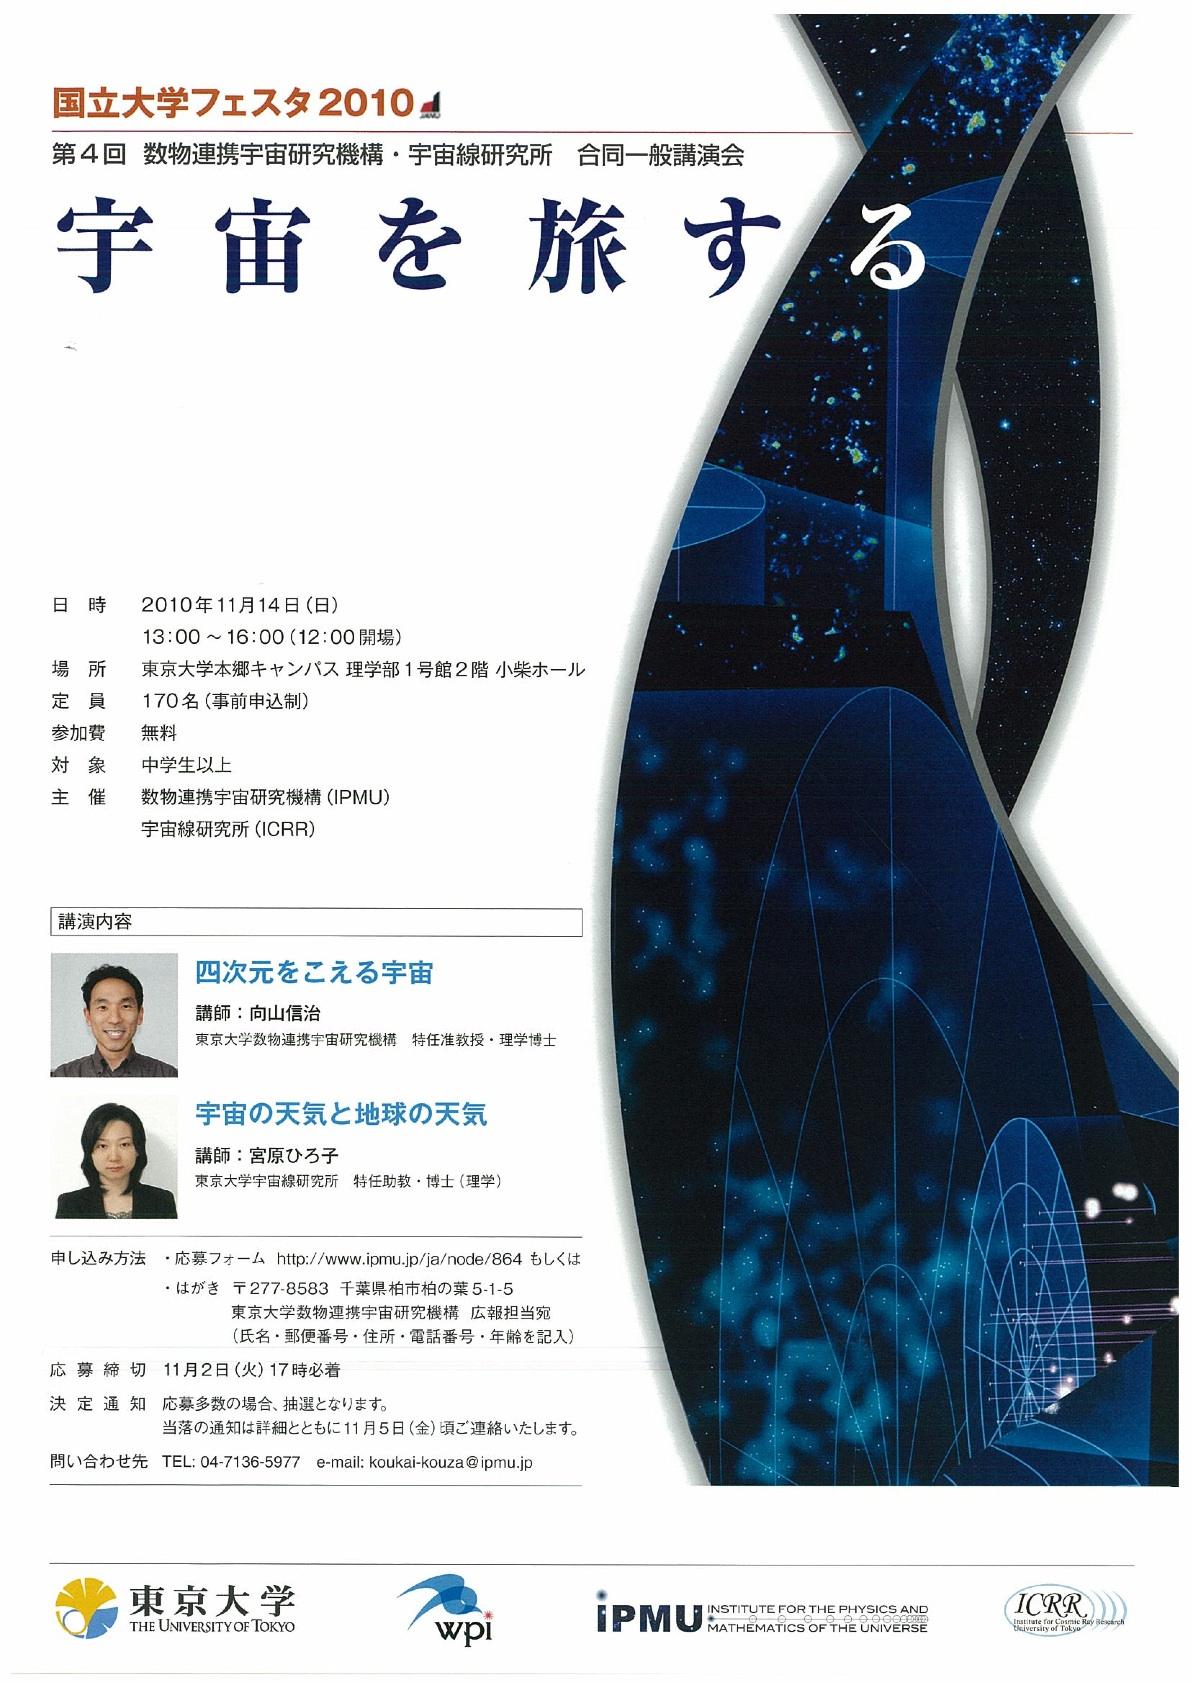 ICRR合同一般講演会「宇宙を旅する」_c0163819_18472033.jpg